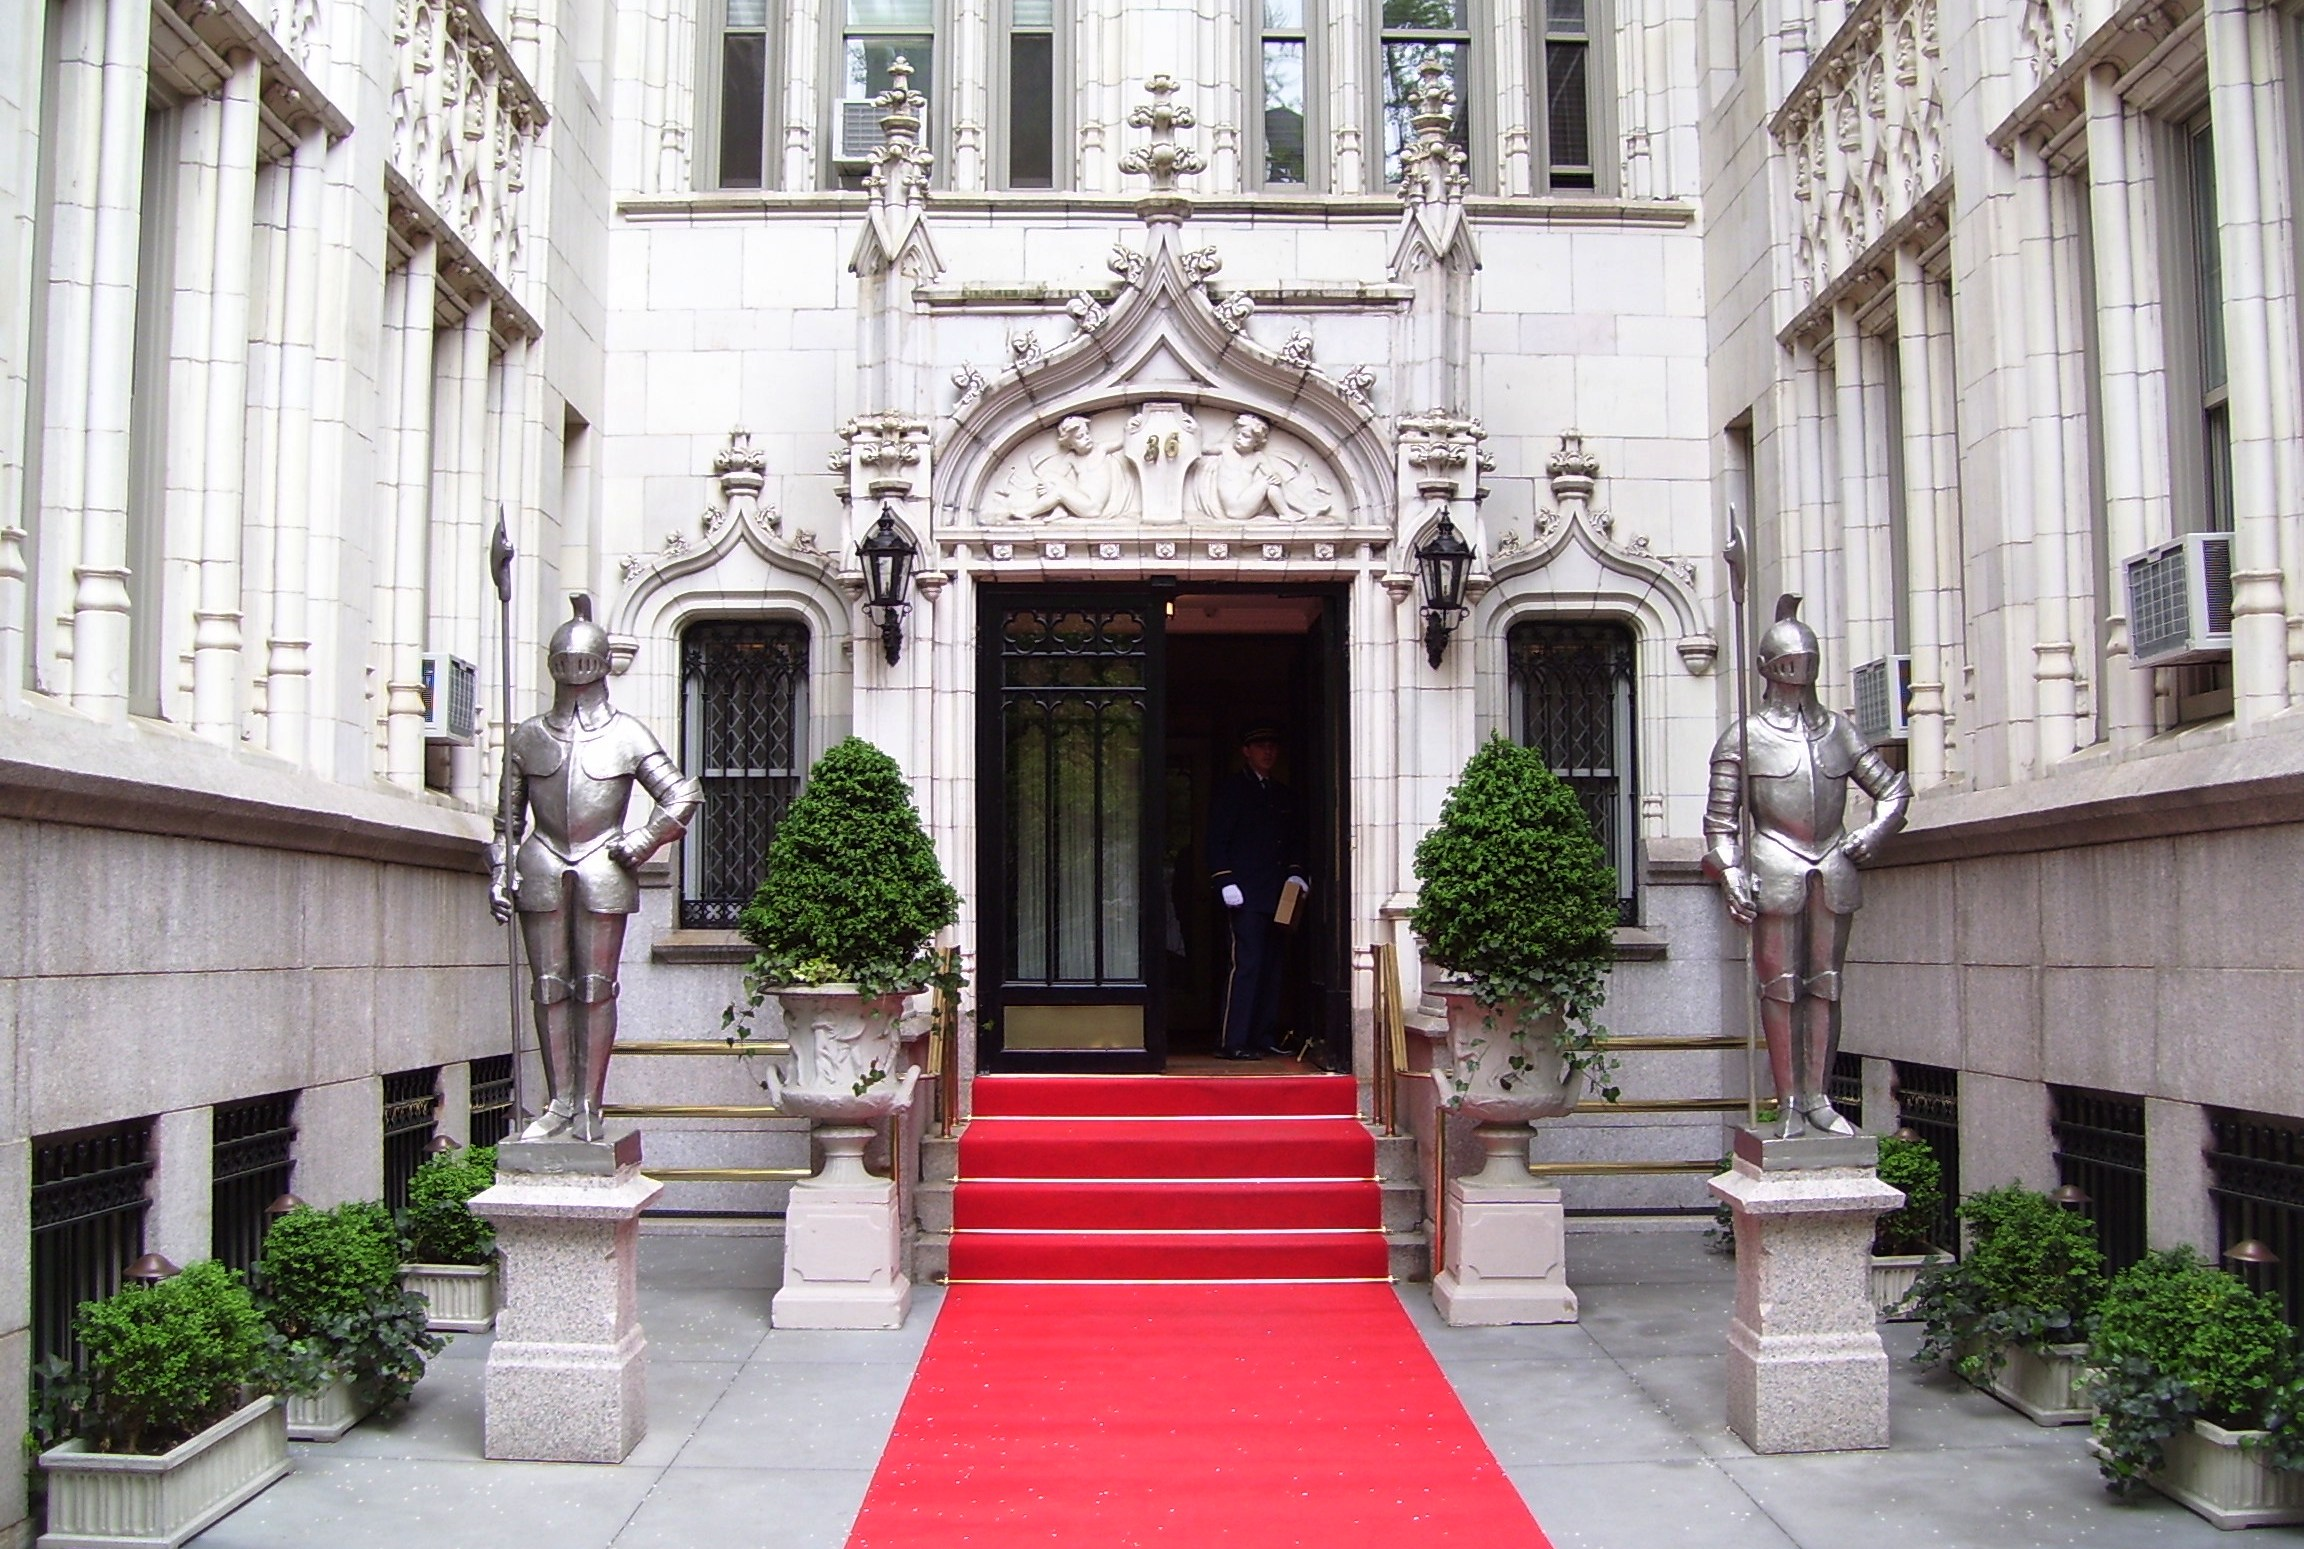 36_Gramercy_Park_entrance